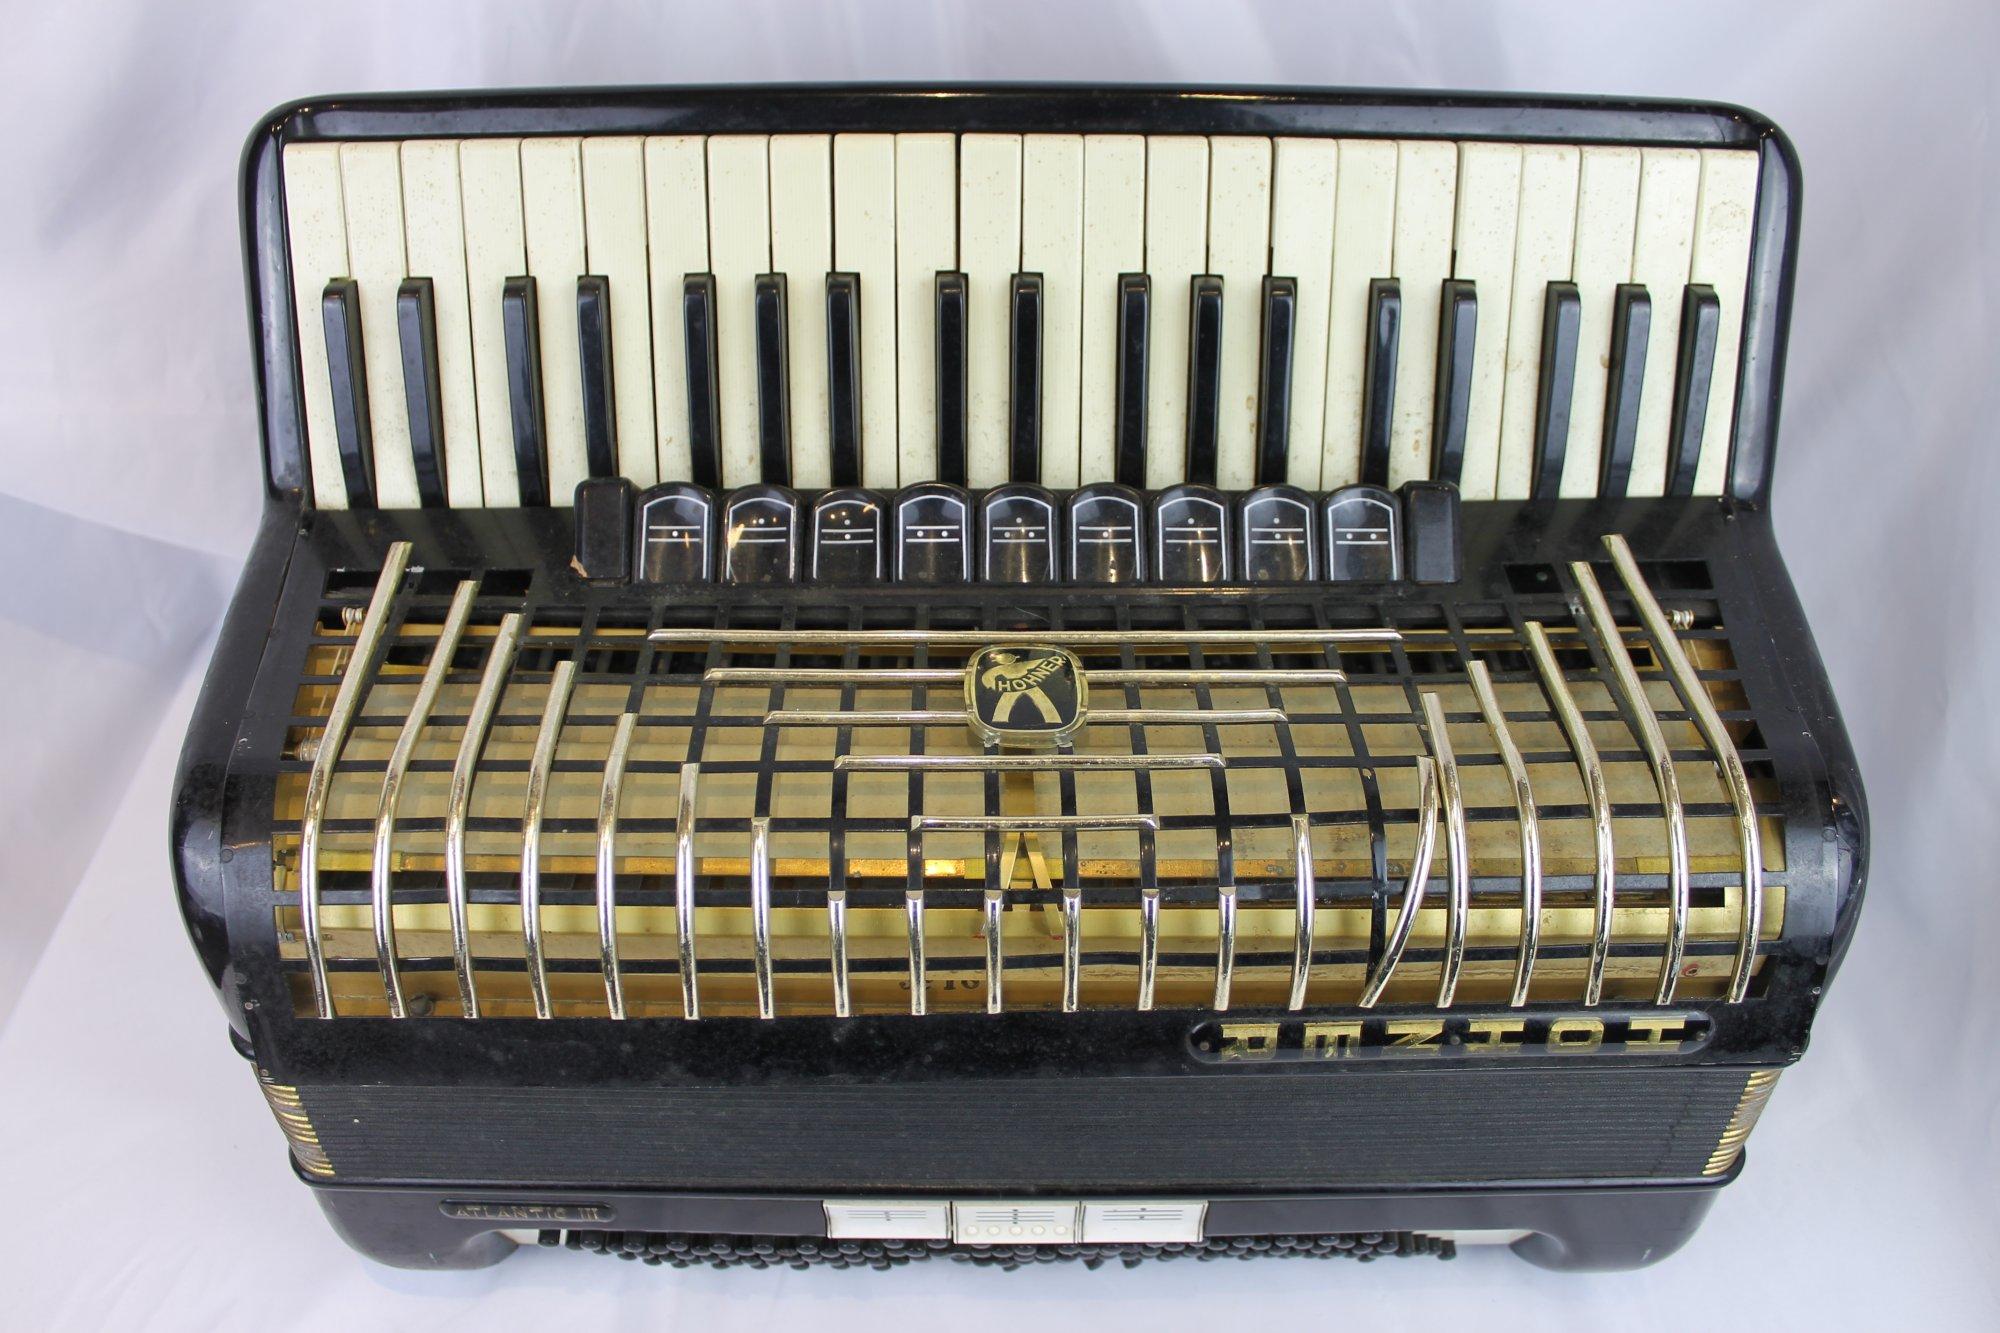 4511 - Black Hohner Atlantic III Piano Accordion LMM 41 120 - For Parts or Repair